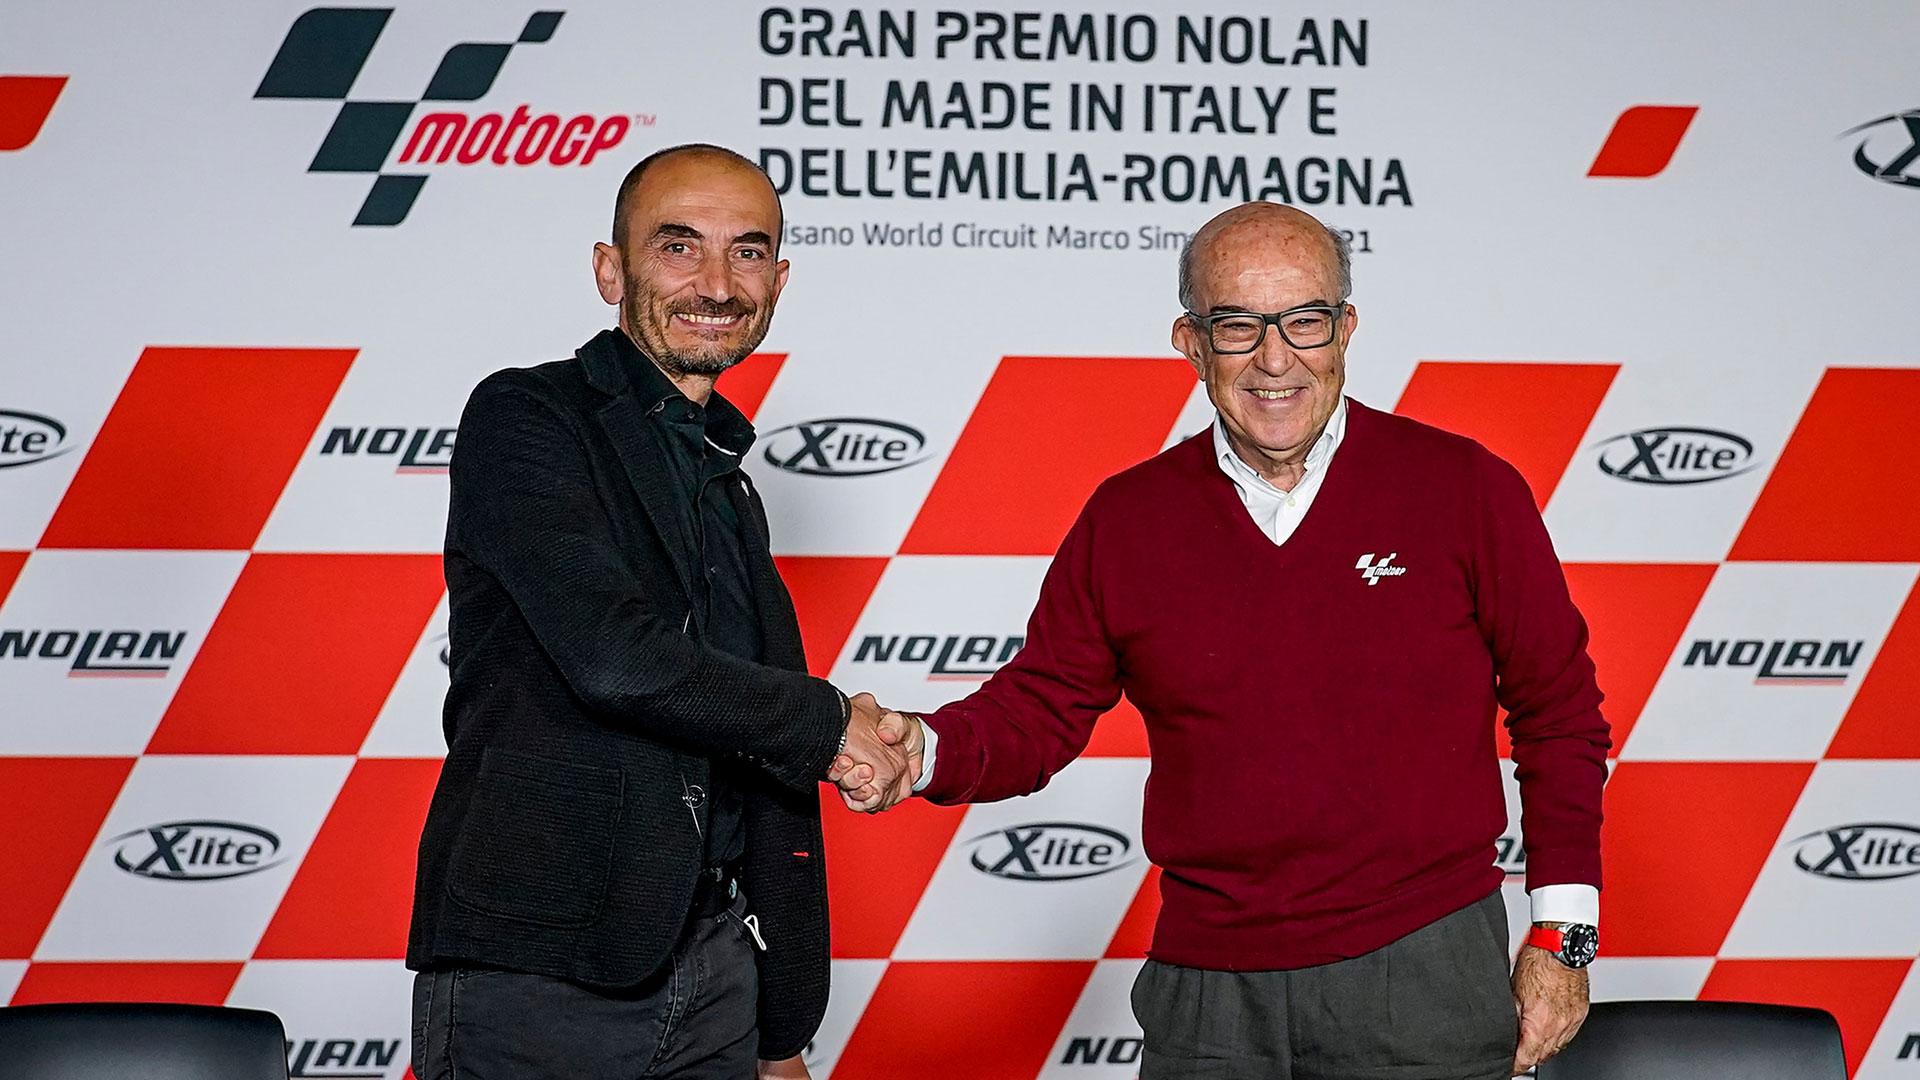 OFICIAL: Ducati se encargará de producir las MotoE a partir de 2023